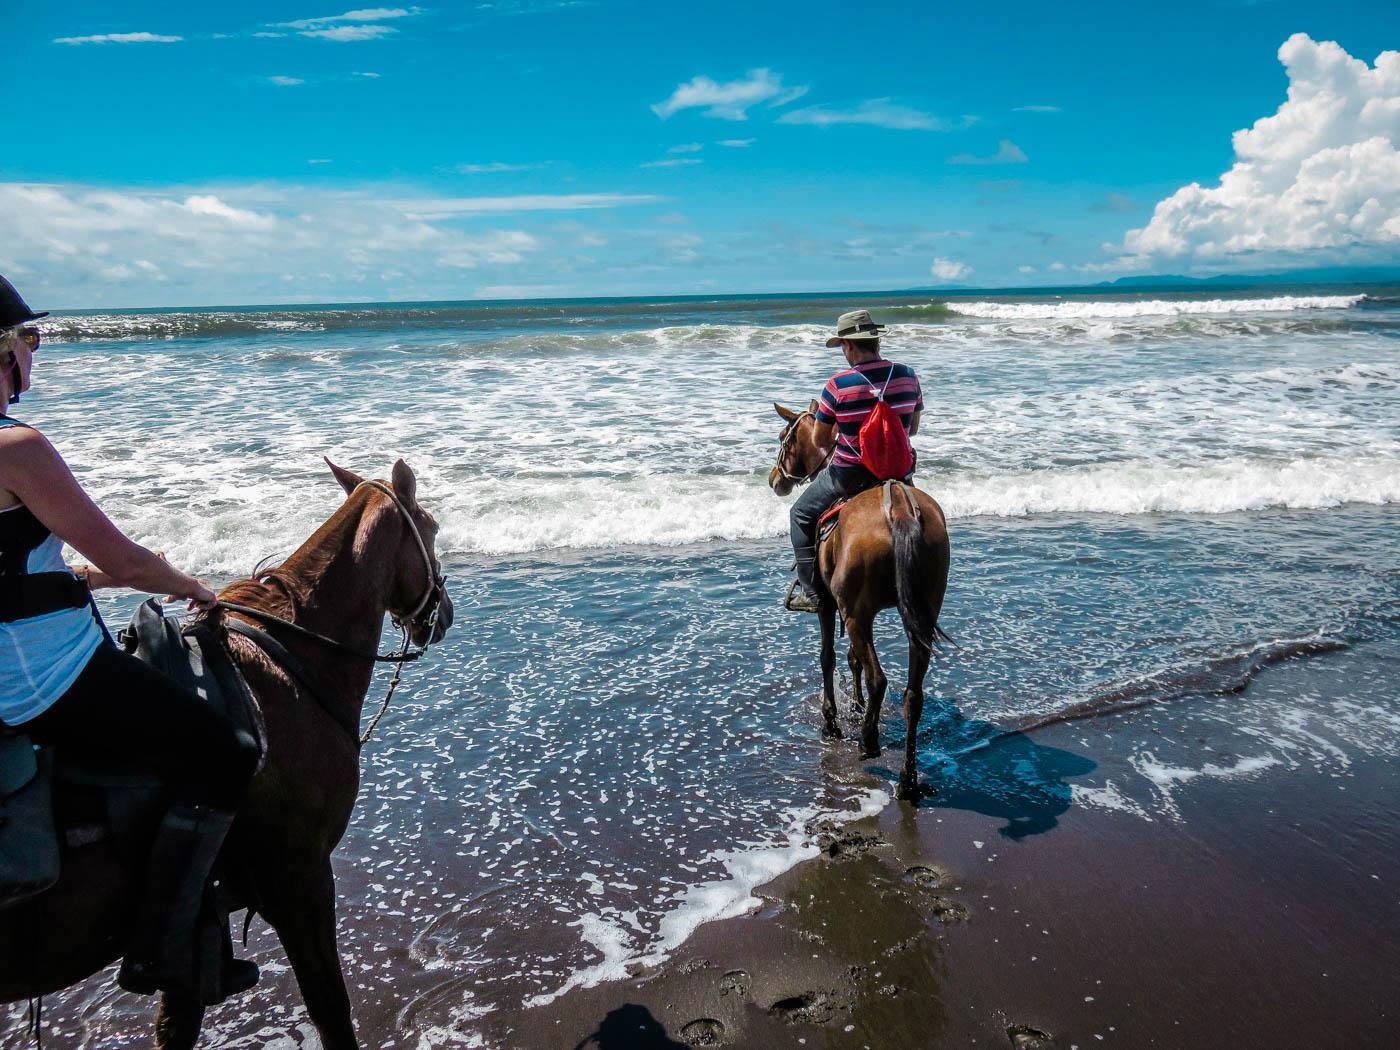 Costa Rica Travel - Horse Riding Adventure I Rainforest I Beach I The Discoveries Of Travel Blog #traveltips #holidaydestinations